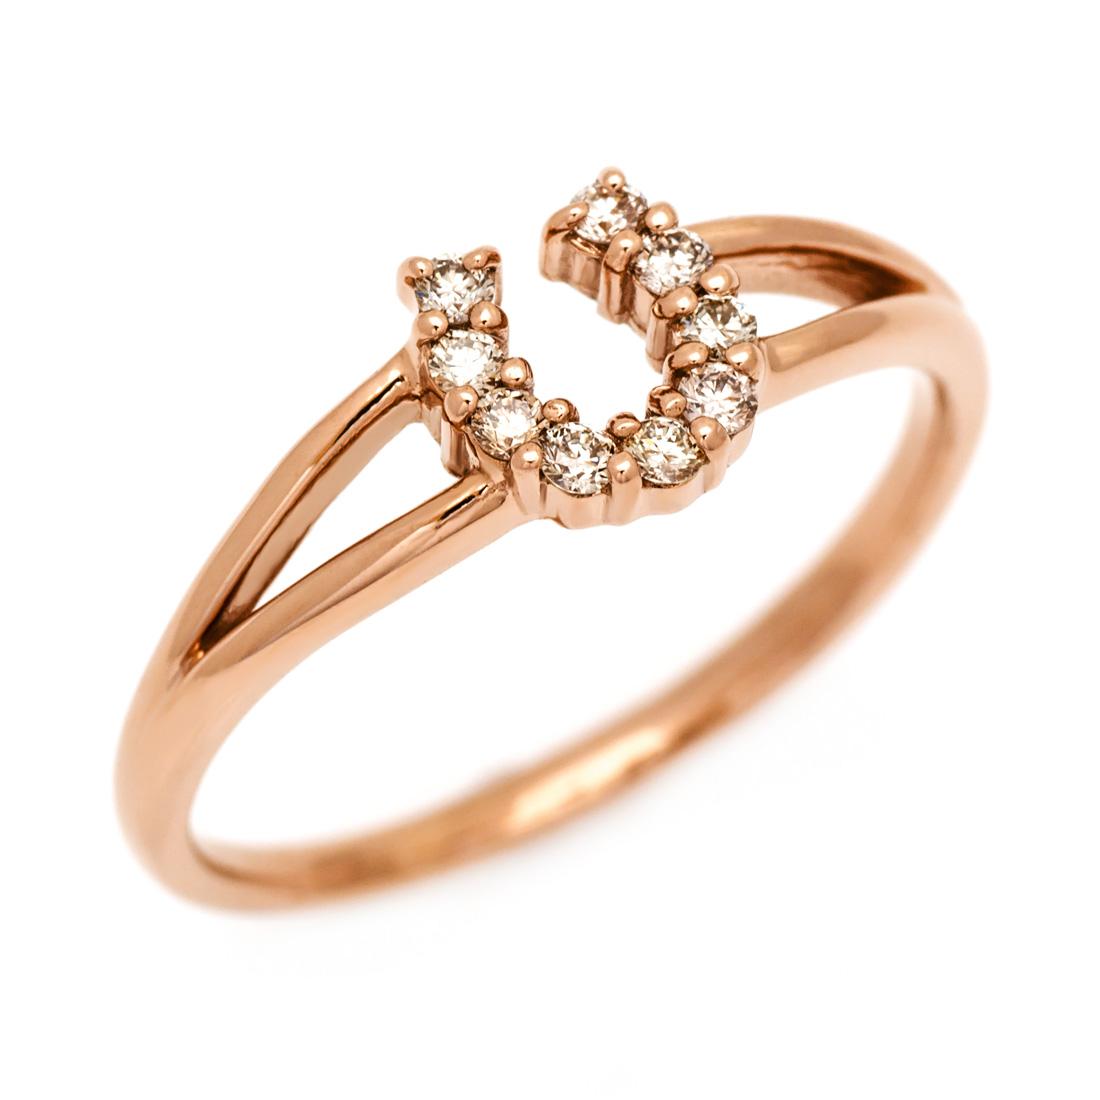 【GWクーポン配布中】K18 ブラウンダイヤモンド リング 「fortuna」送料無料 指輪 ダイアモンド ゴールド 18K 18金 馬蹄 ホースシュー 誕生日 4月誕生石 刻印 文字入れ メッセージ ギフト 贈り物 ピンキーリング対応可能